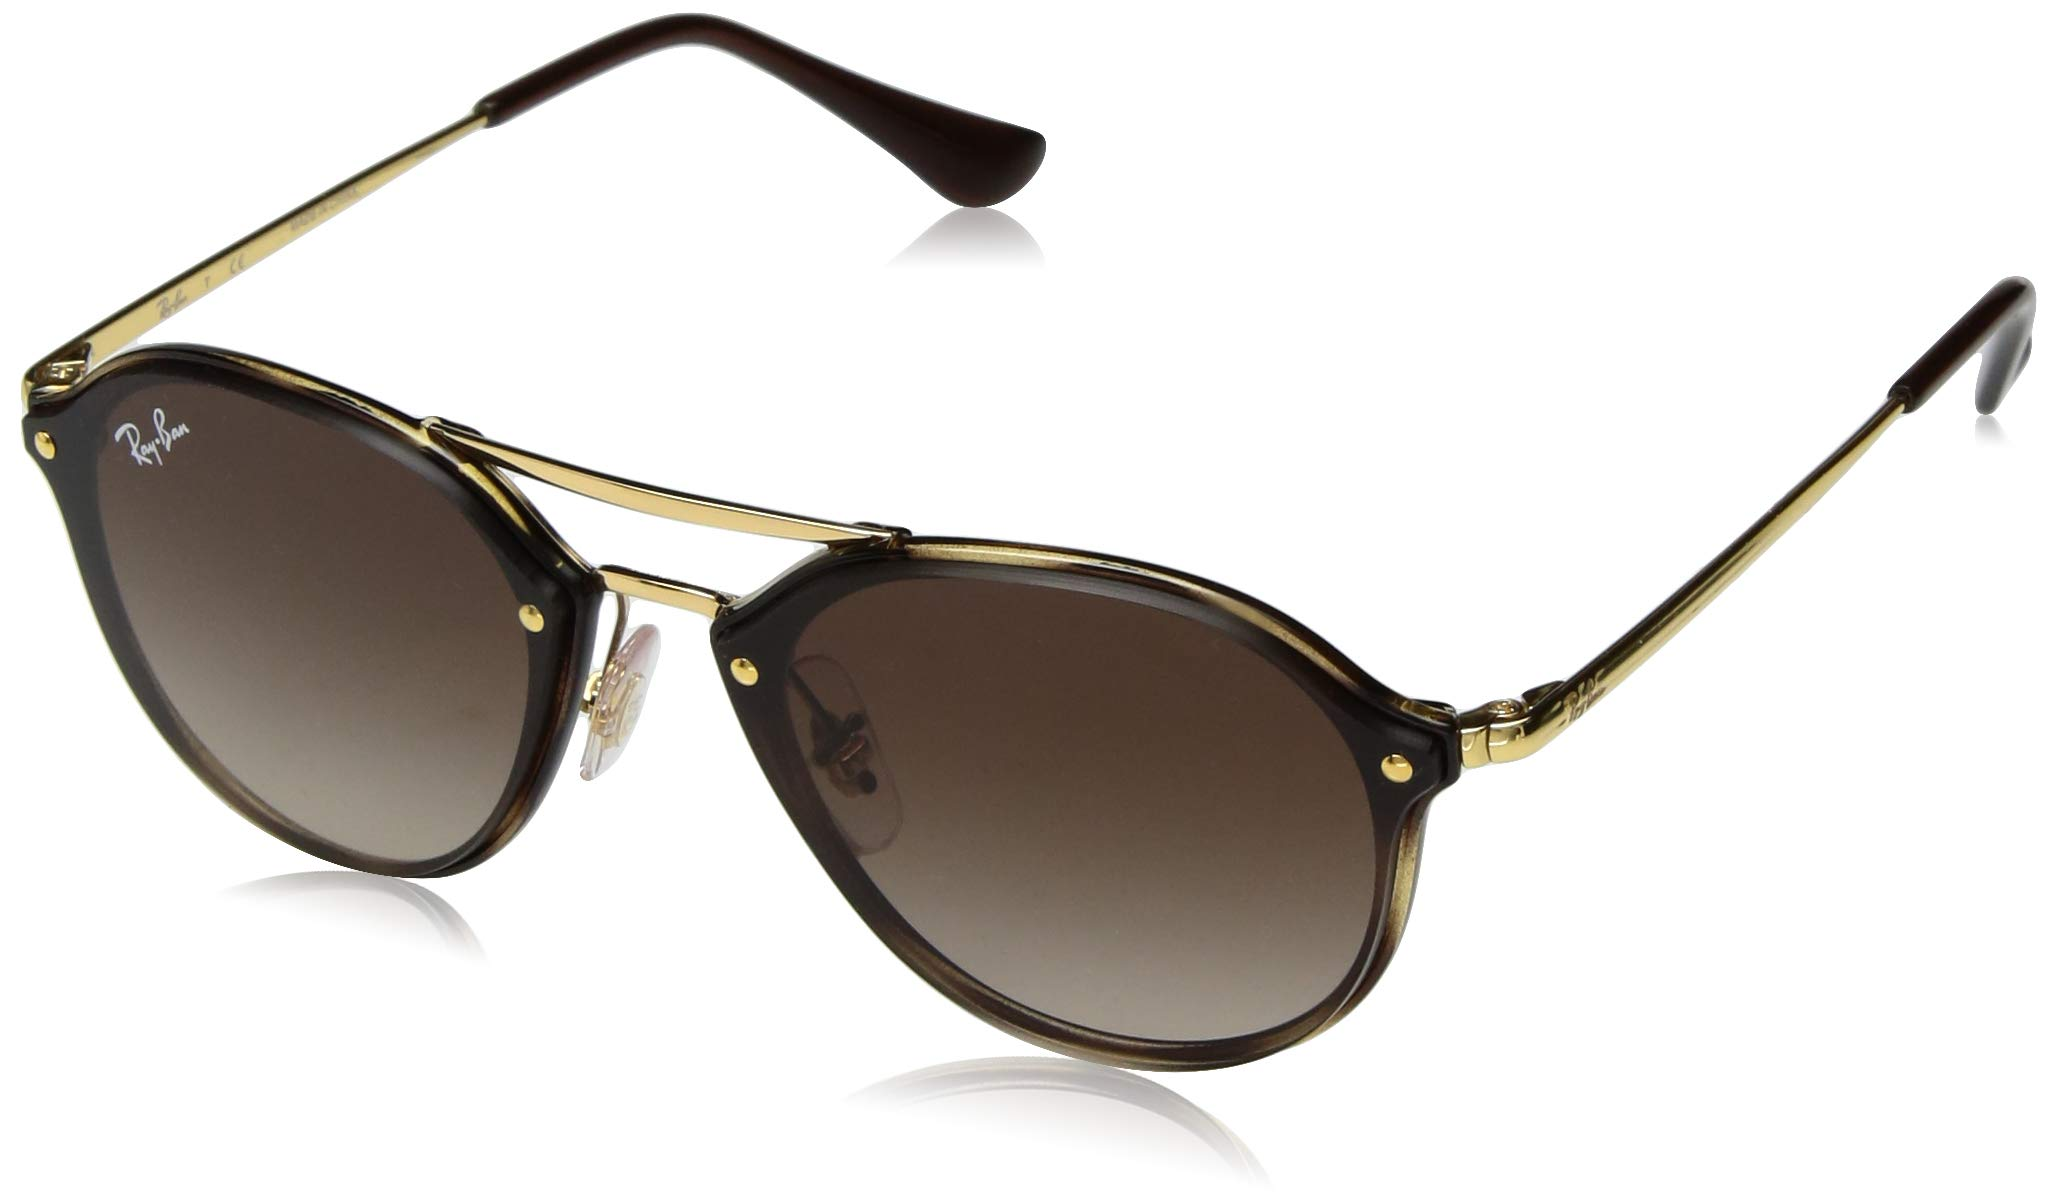 Ray-Ban Junior RJ9067SN Double Bridge Kids Sunglasses, Shiny Tortoise/Brown Gradient, 53 mm